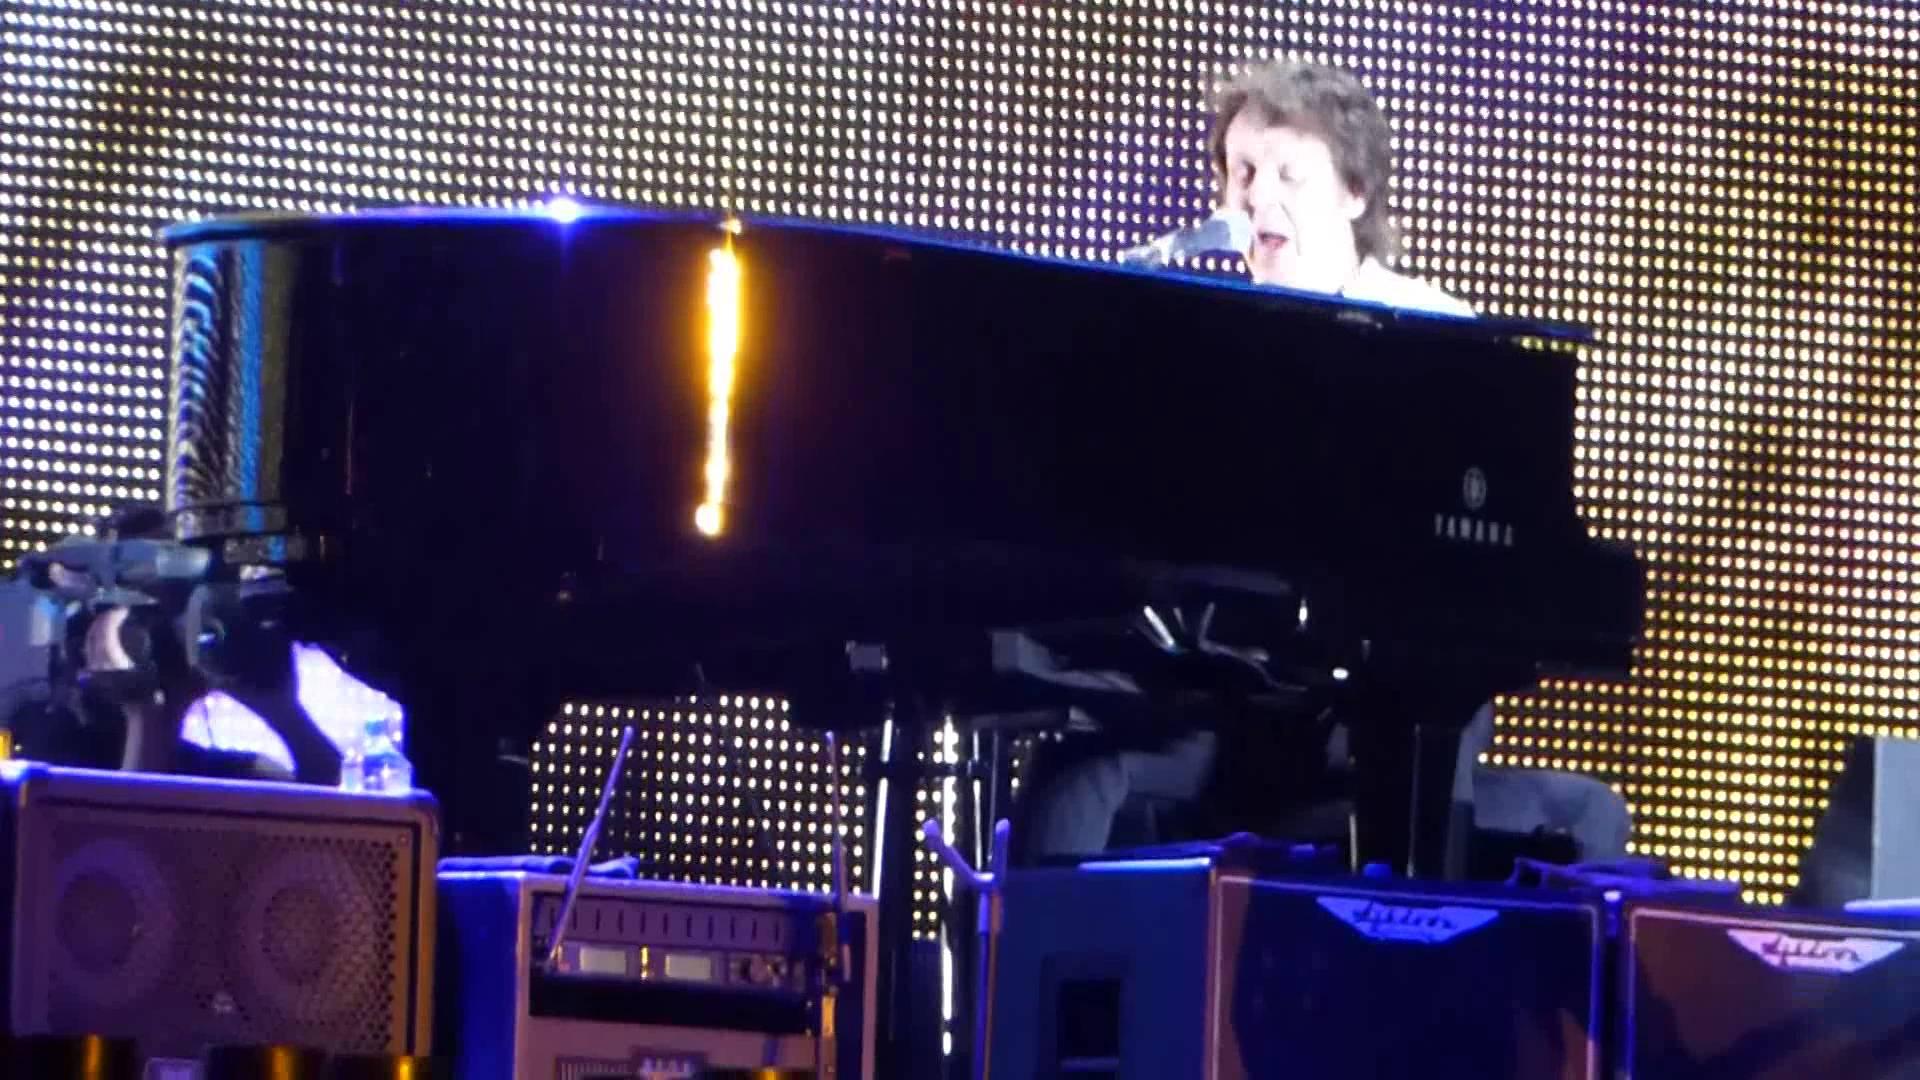 See Paul McCartney dedicate song in memory of Charleston at Firefly festival